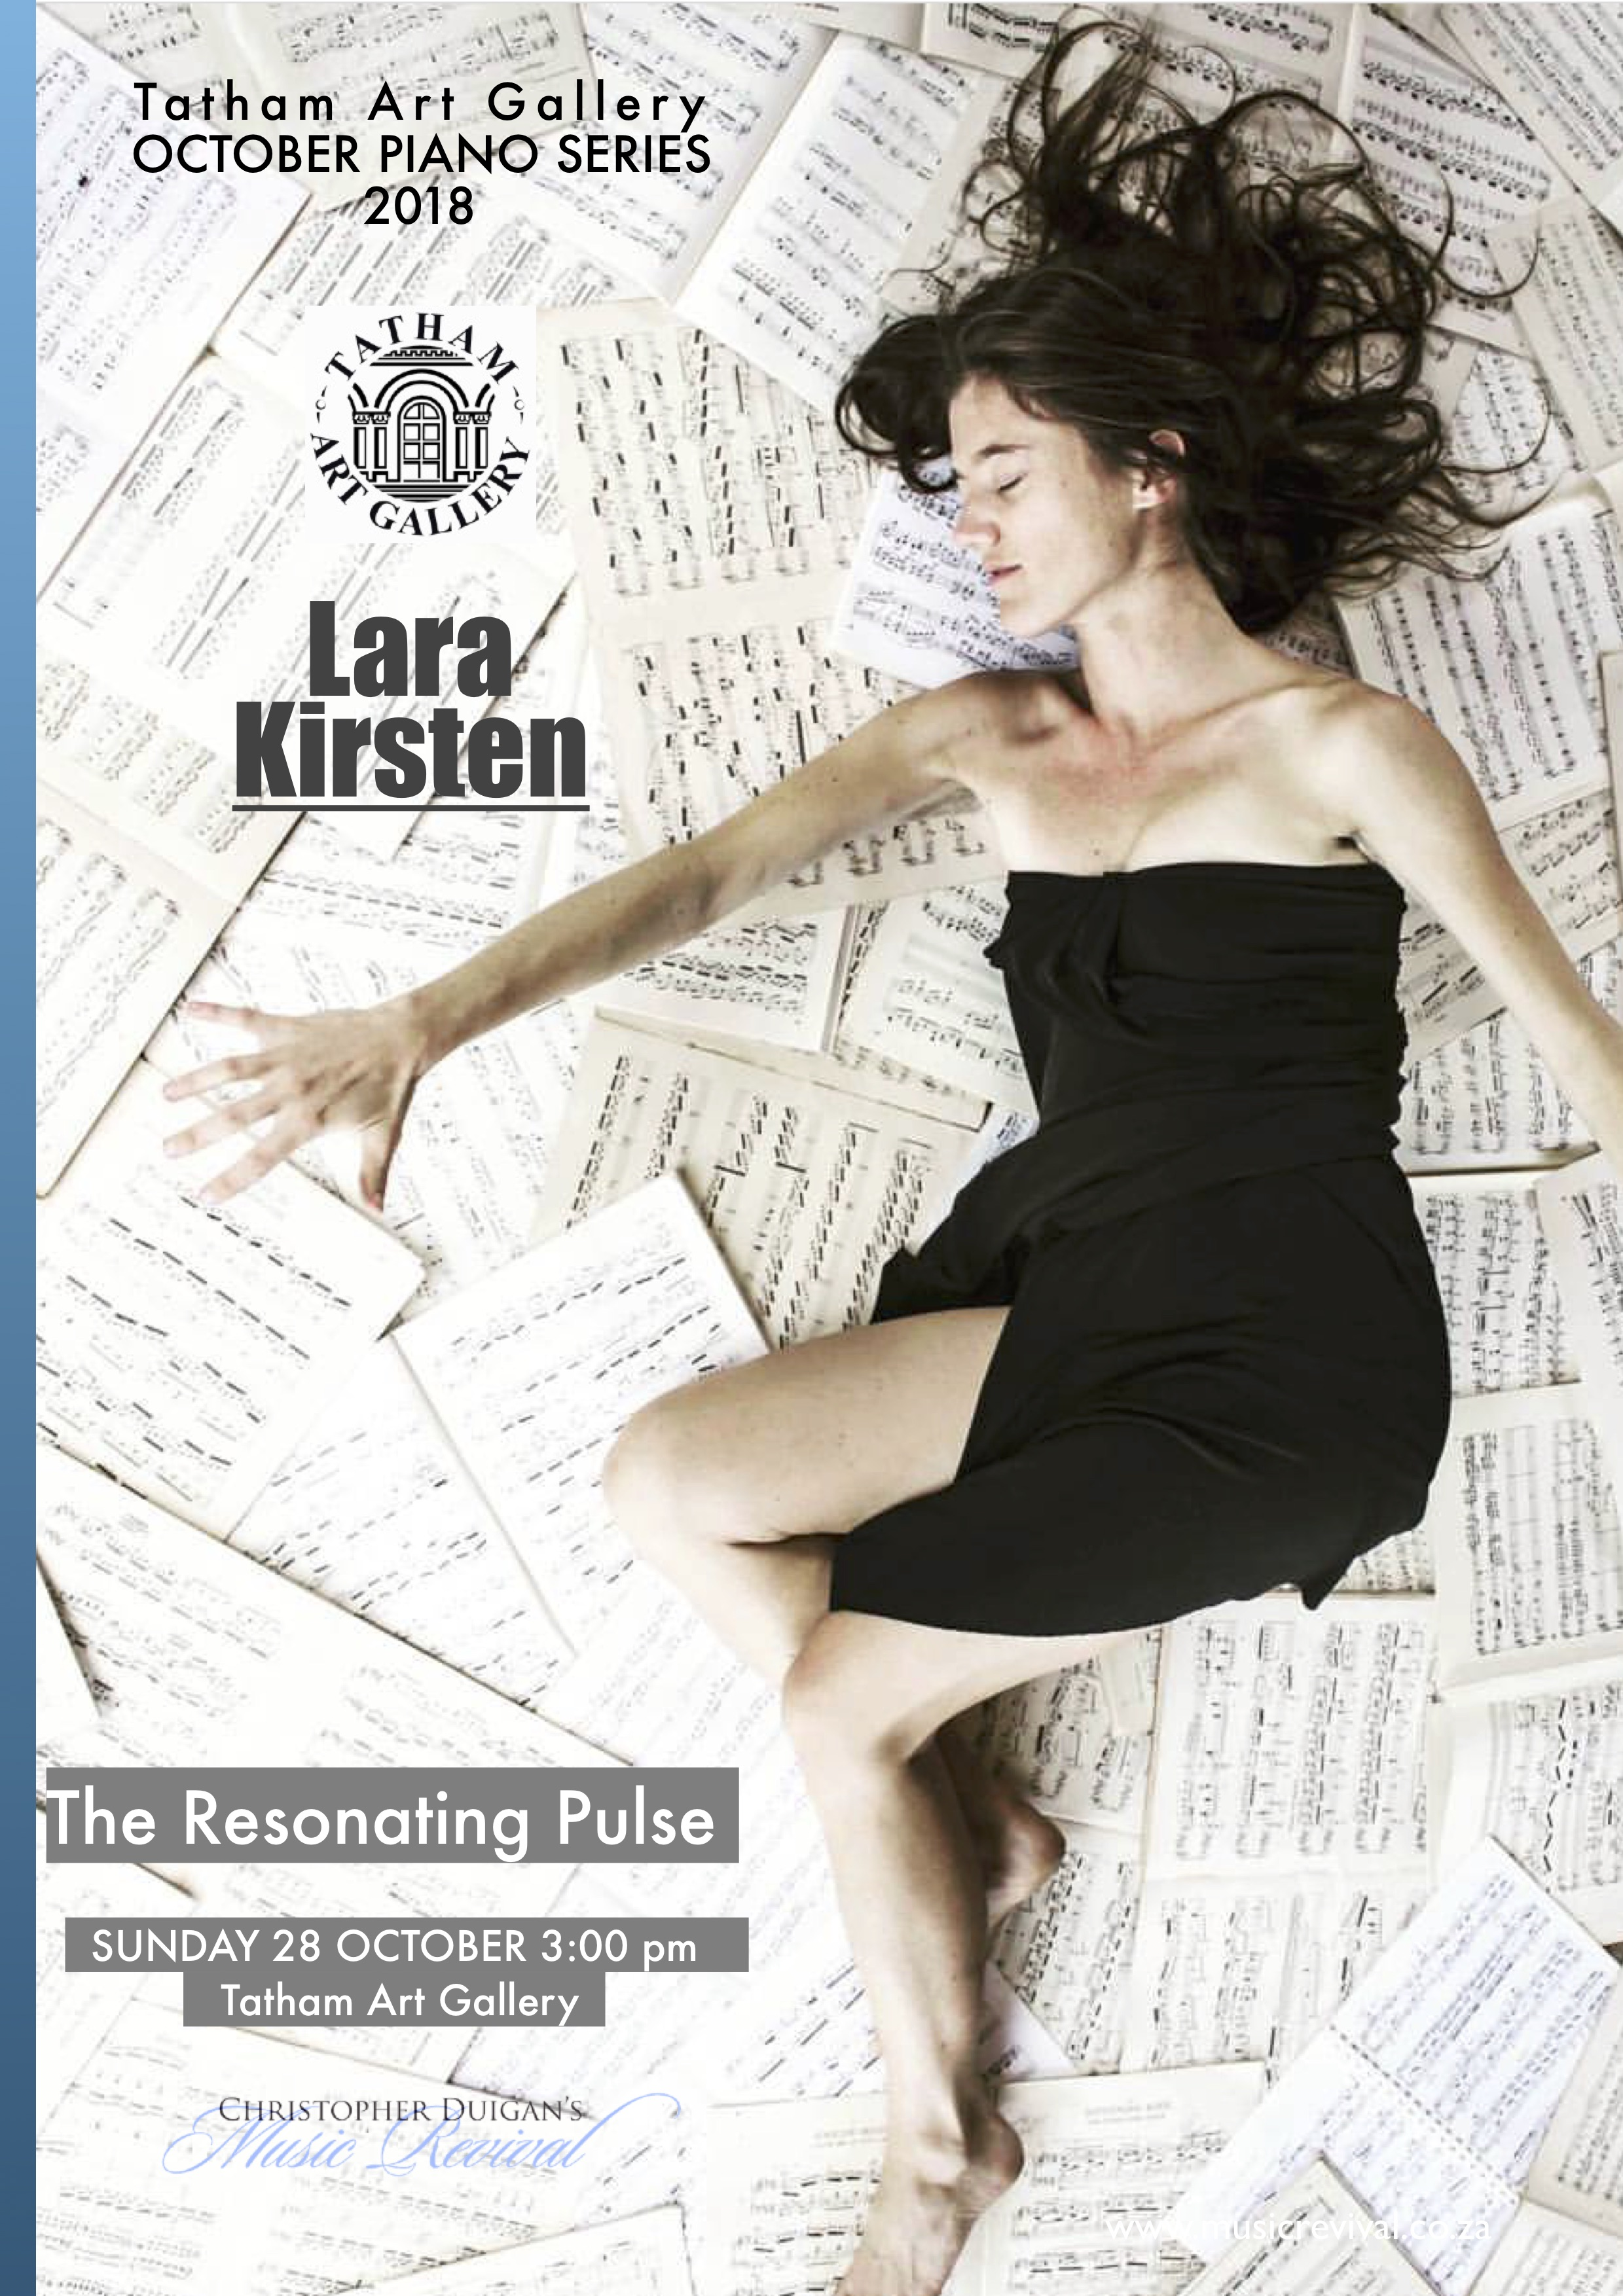 TAG Piano Lara K    copy.jpg